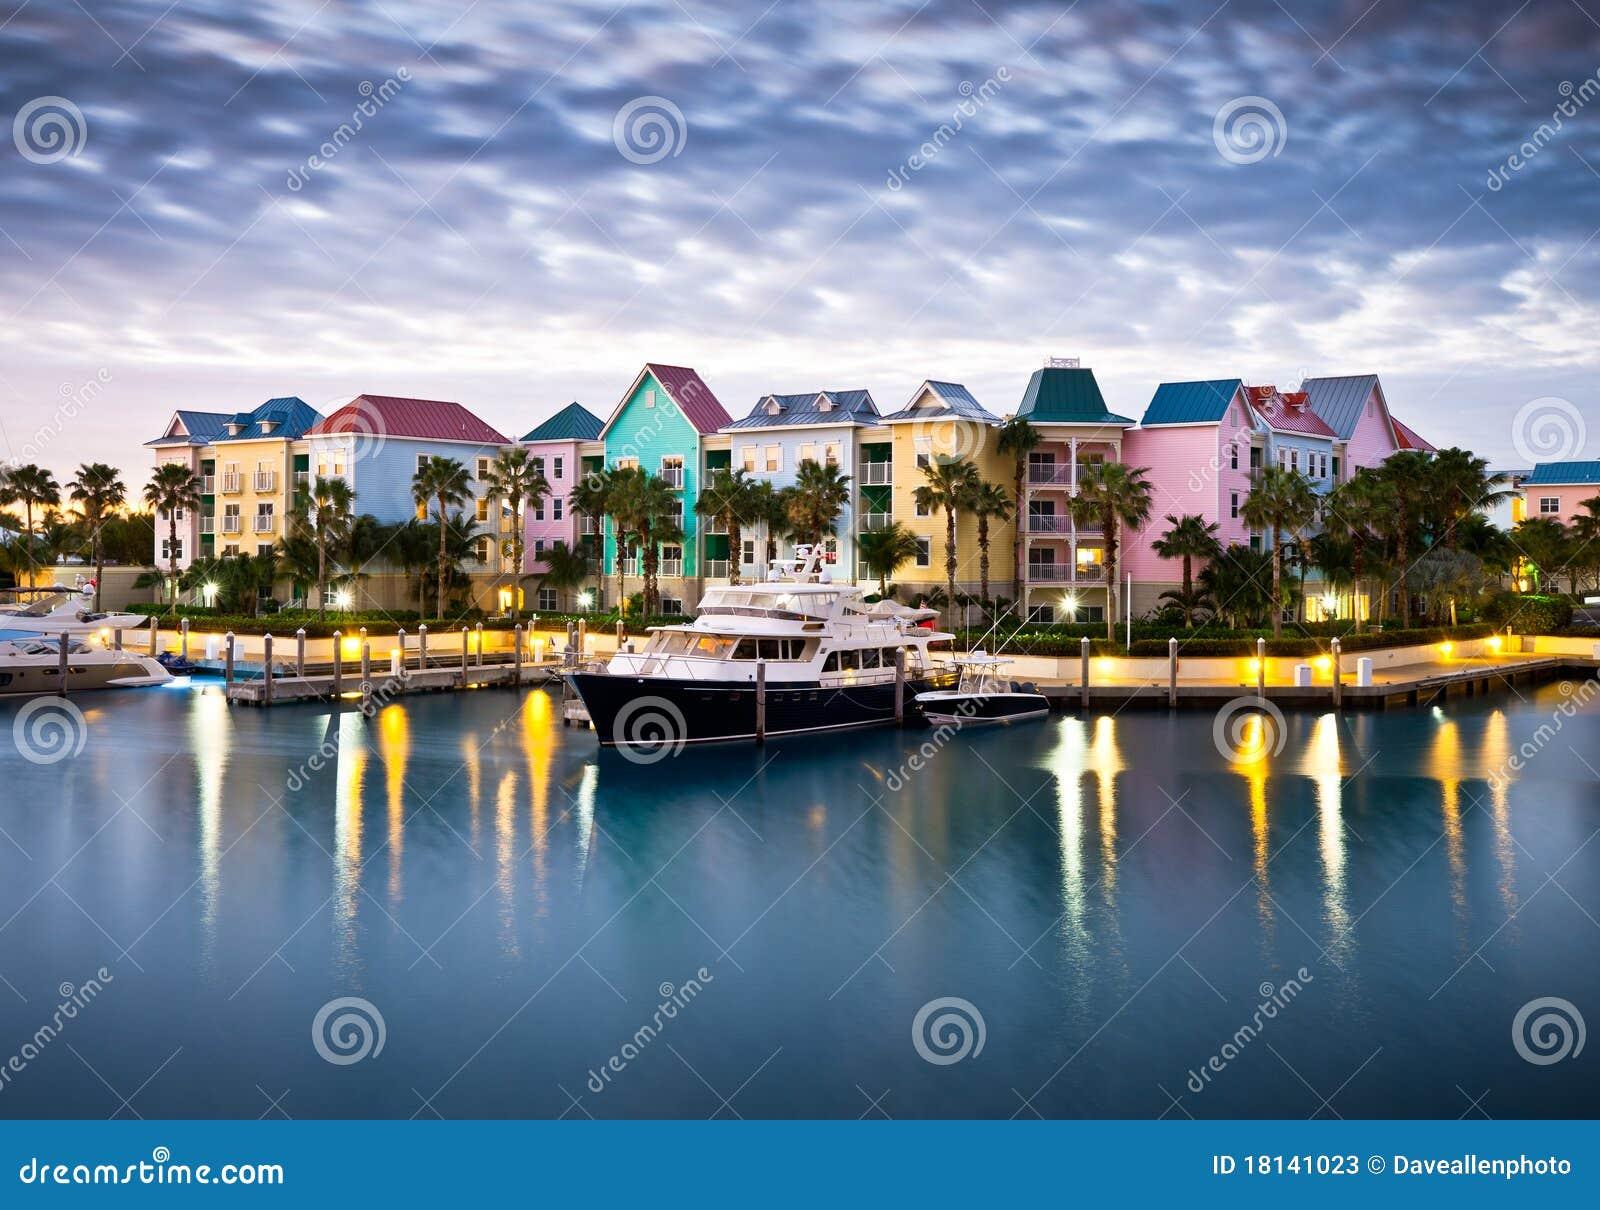 Tropical Caribbean Harbor Marina and Yacht